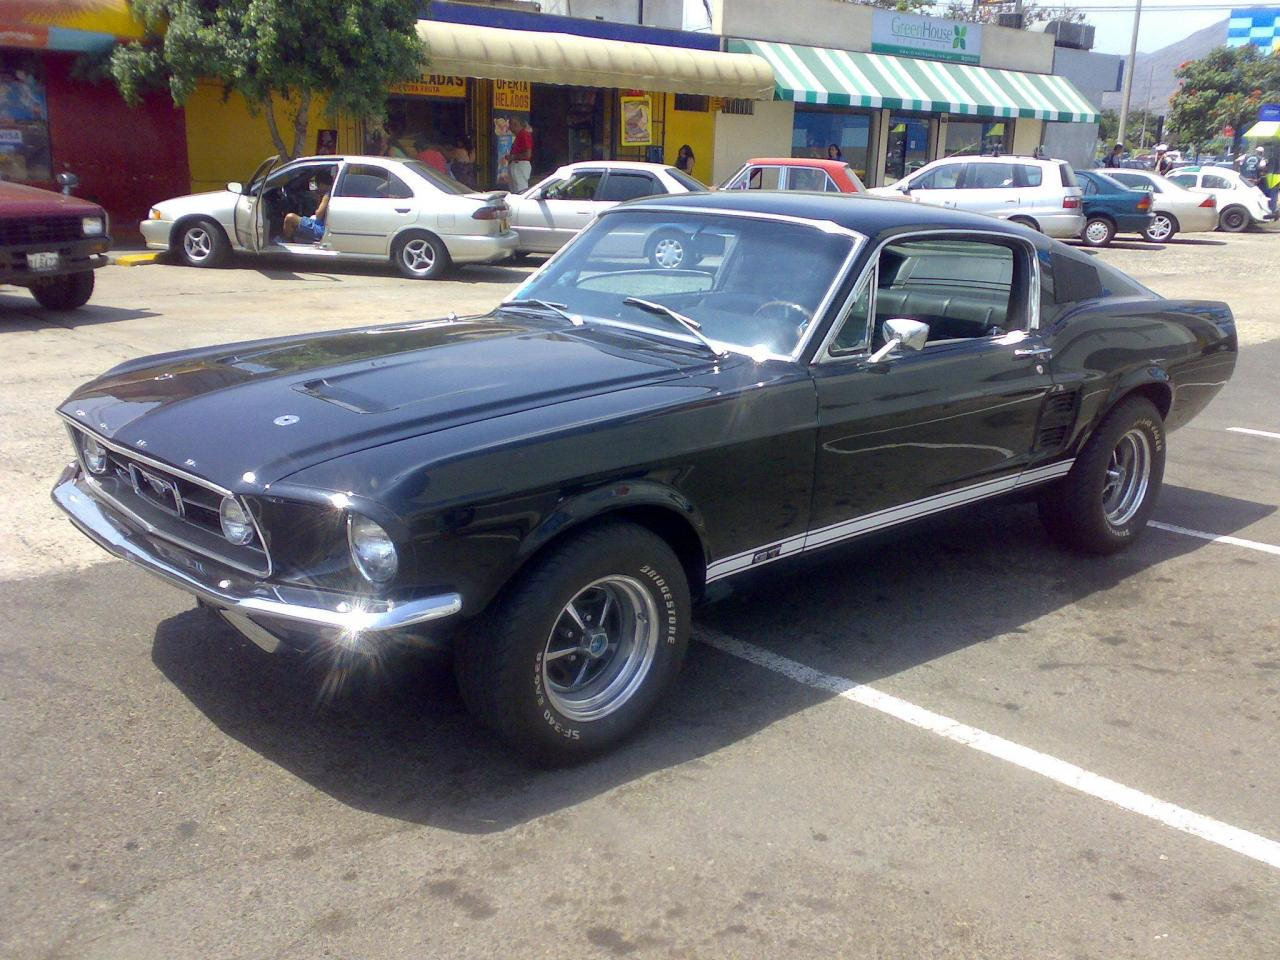 Ford Mustang 1967 Comprar